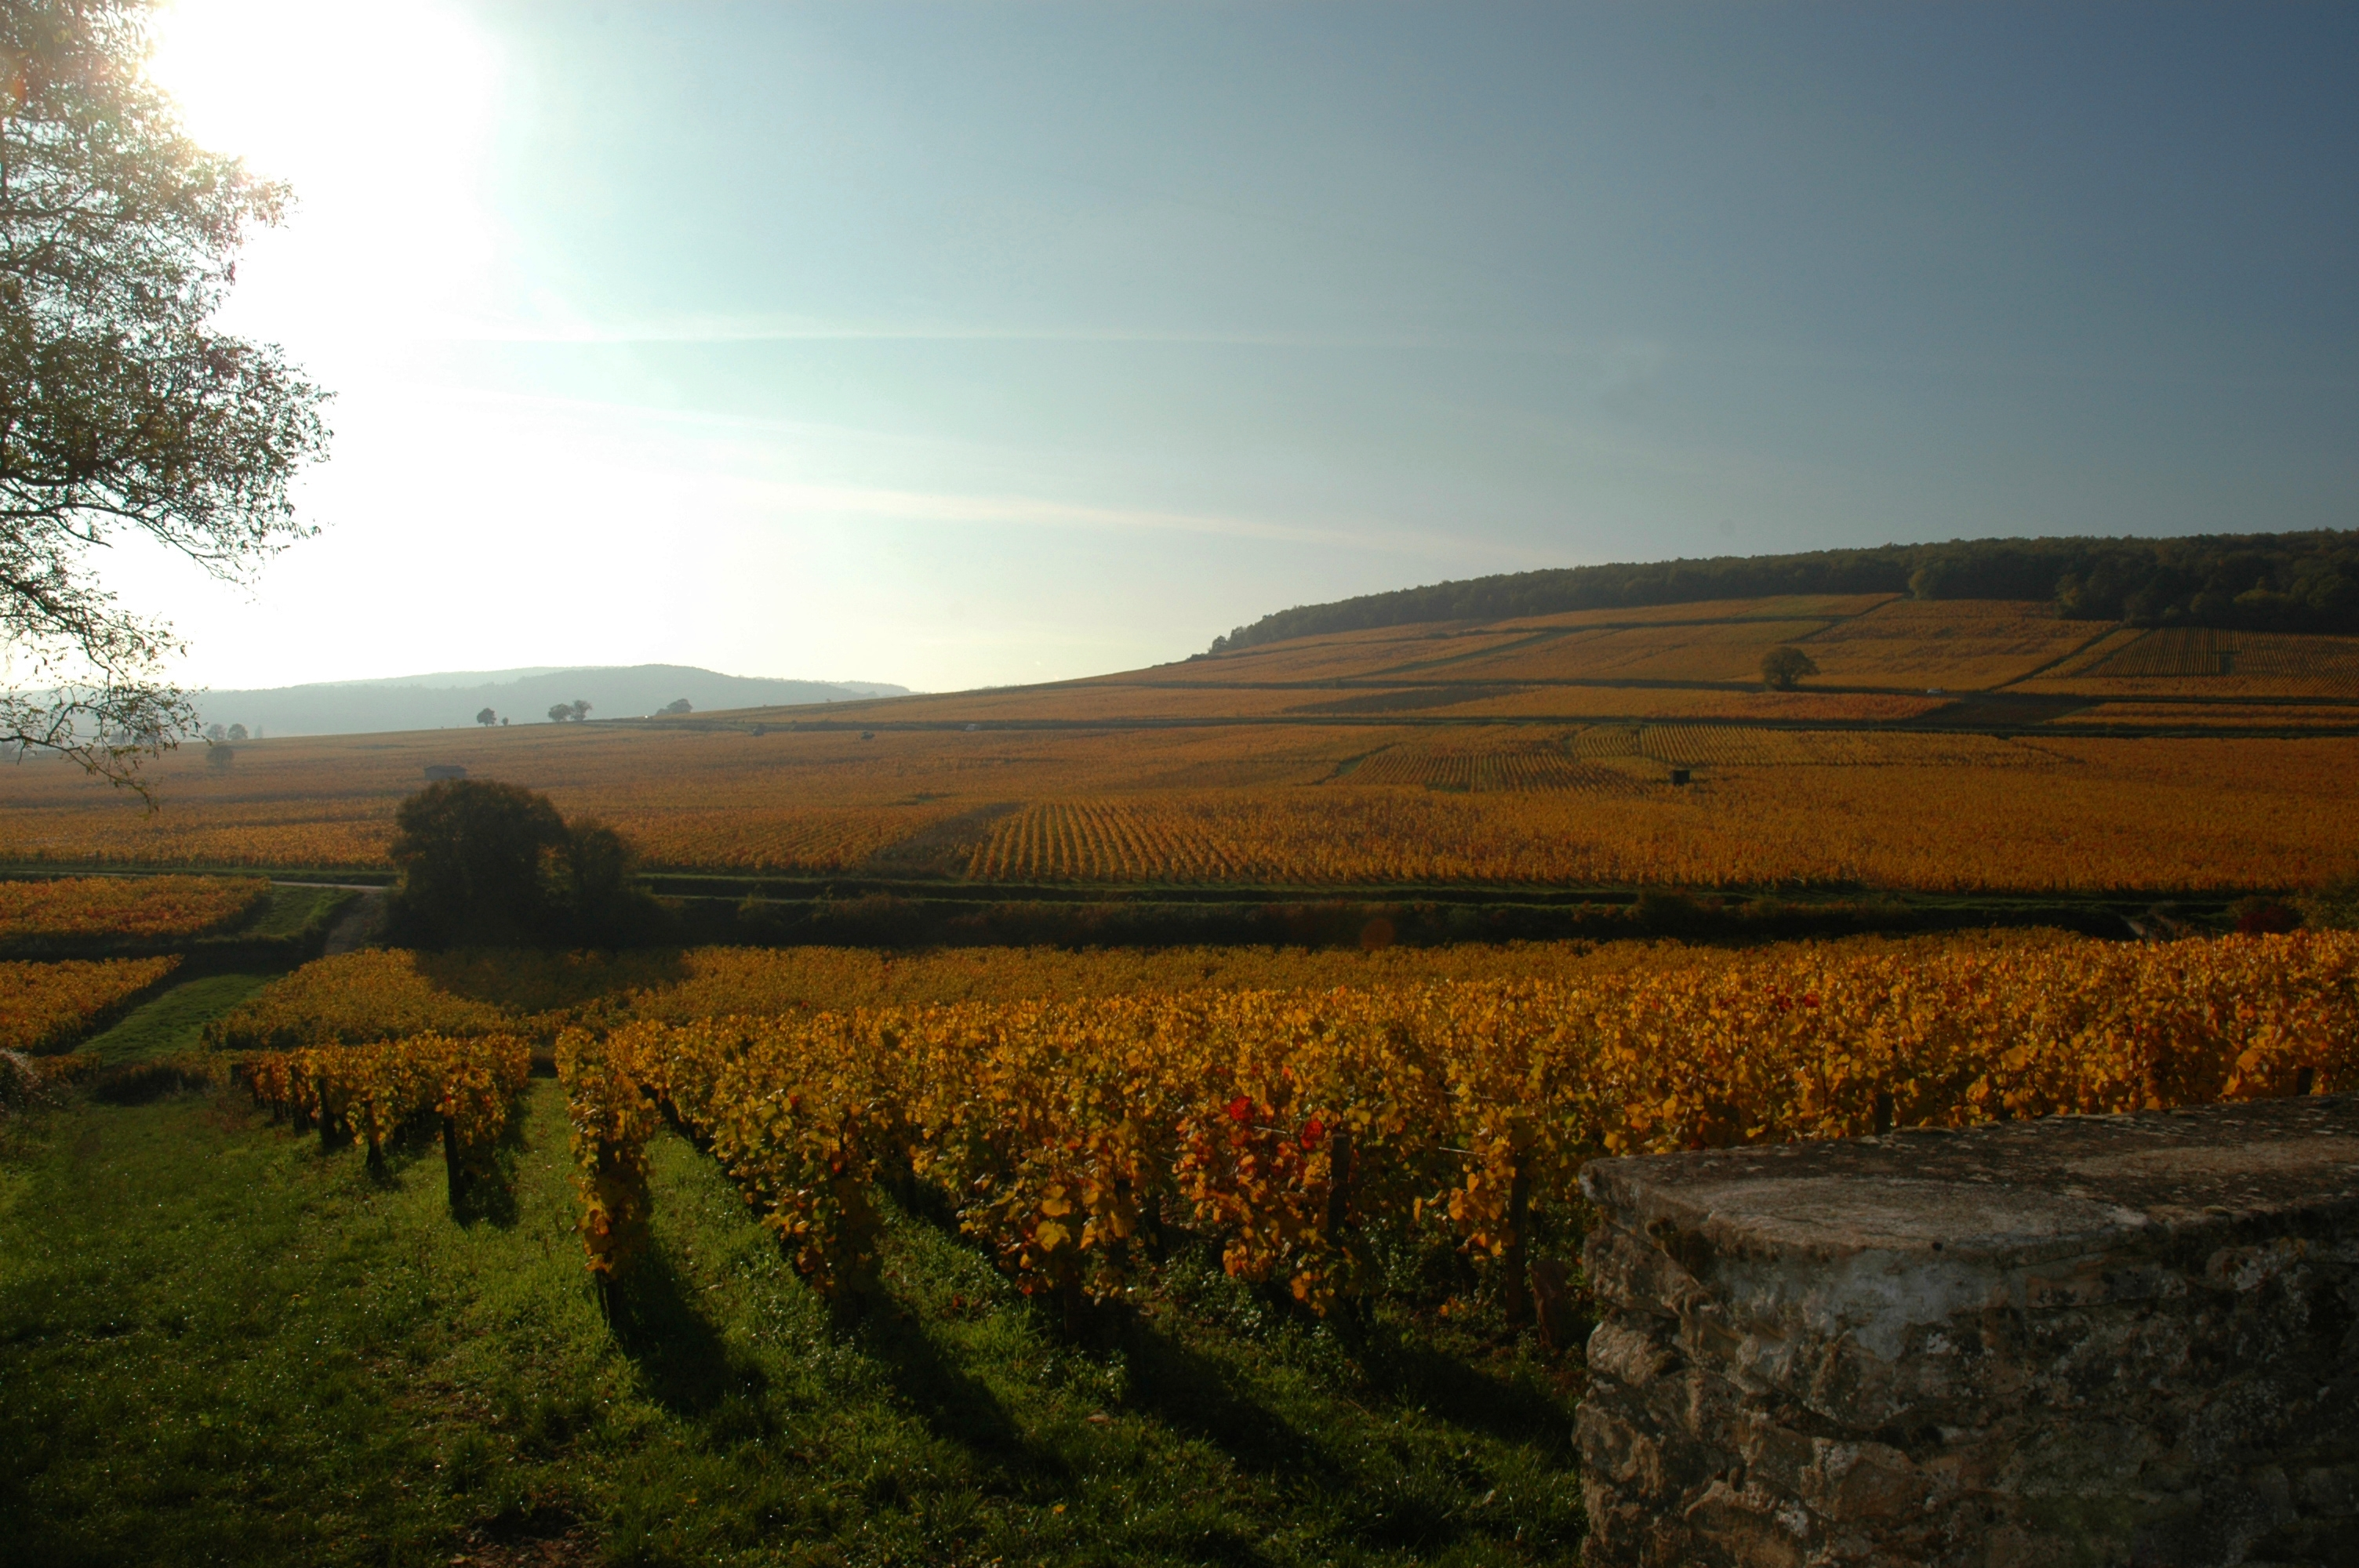 Vignes de Corton proches des Chambres Buissonnieres Ladoix Serrigny route des grands crus (5)